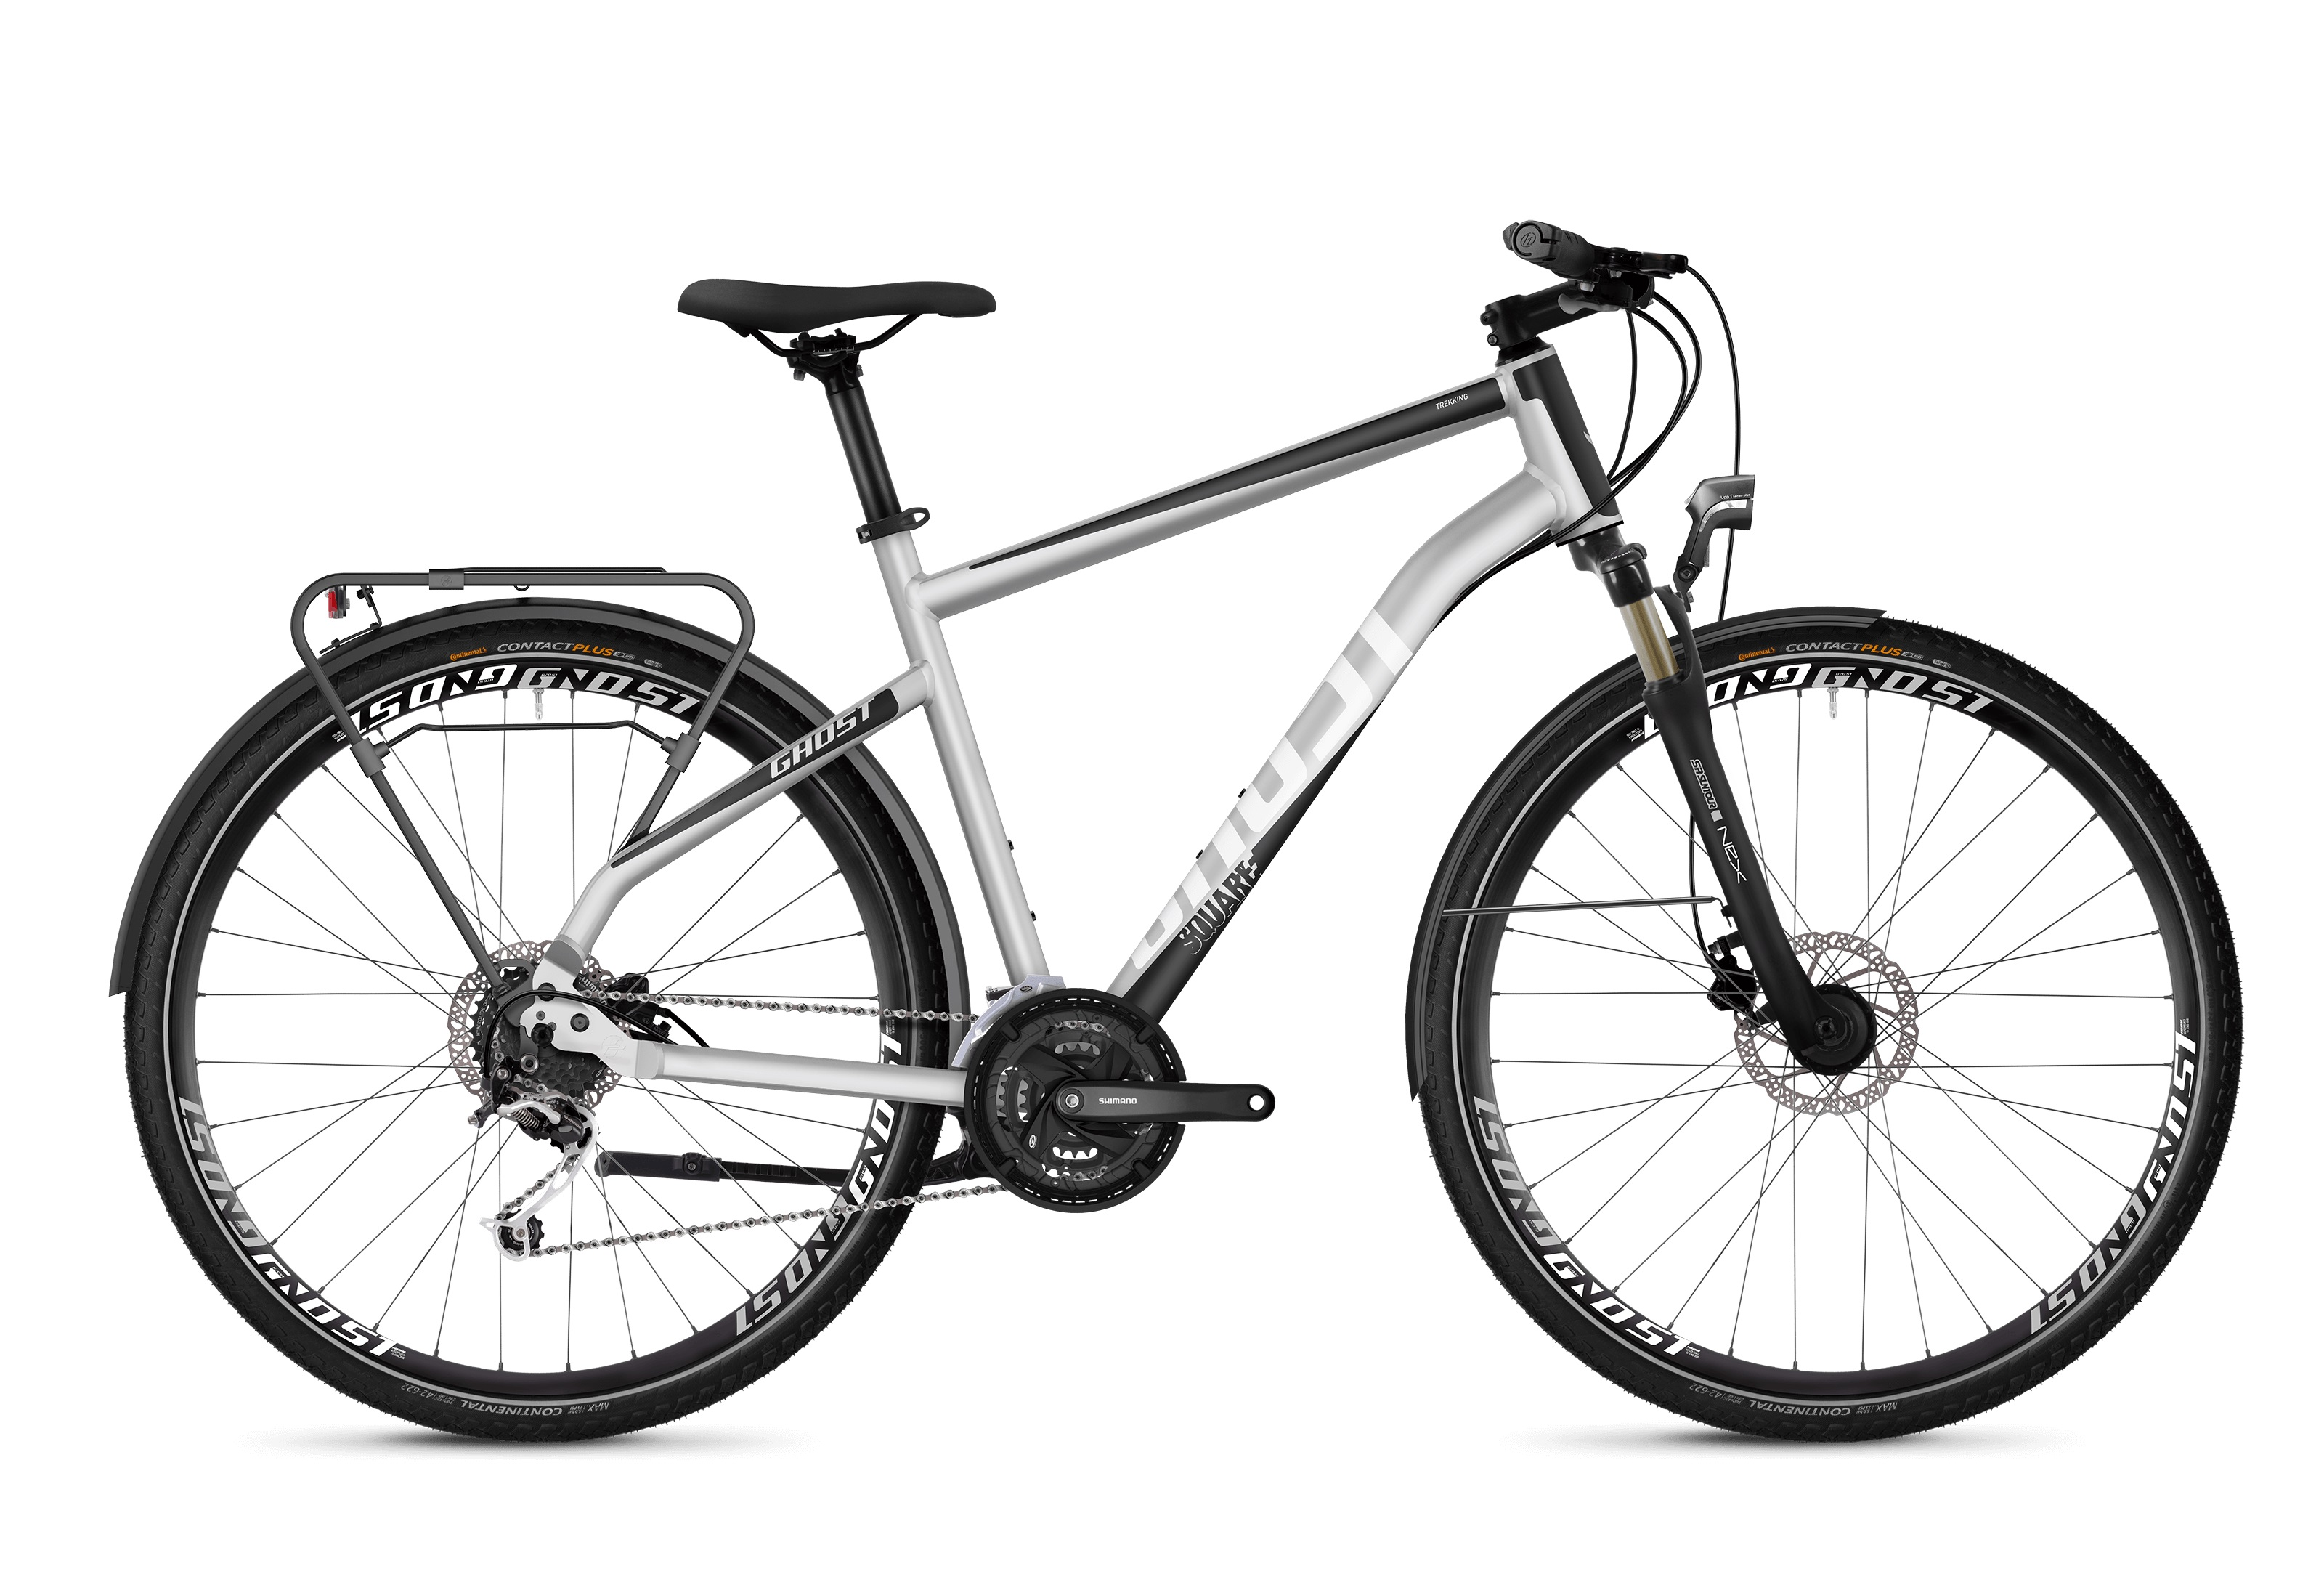 Bicykel GHOST Square Trekking 4.8 iridium silver / jet black / star white 2019